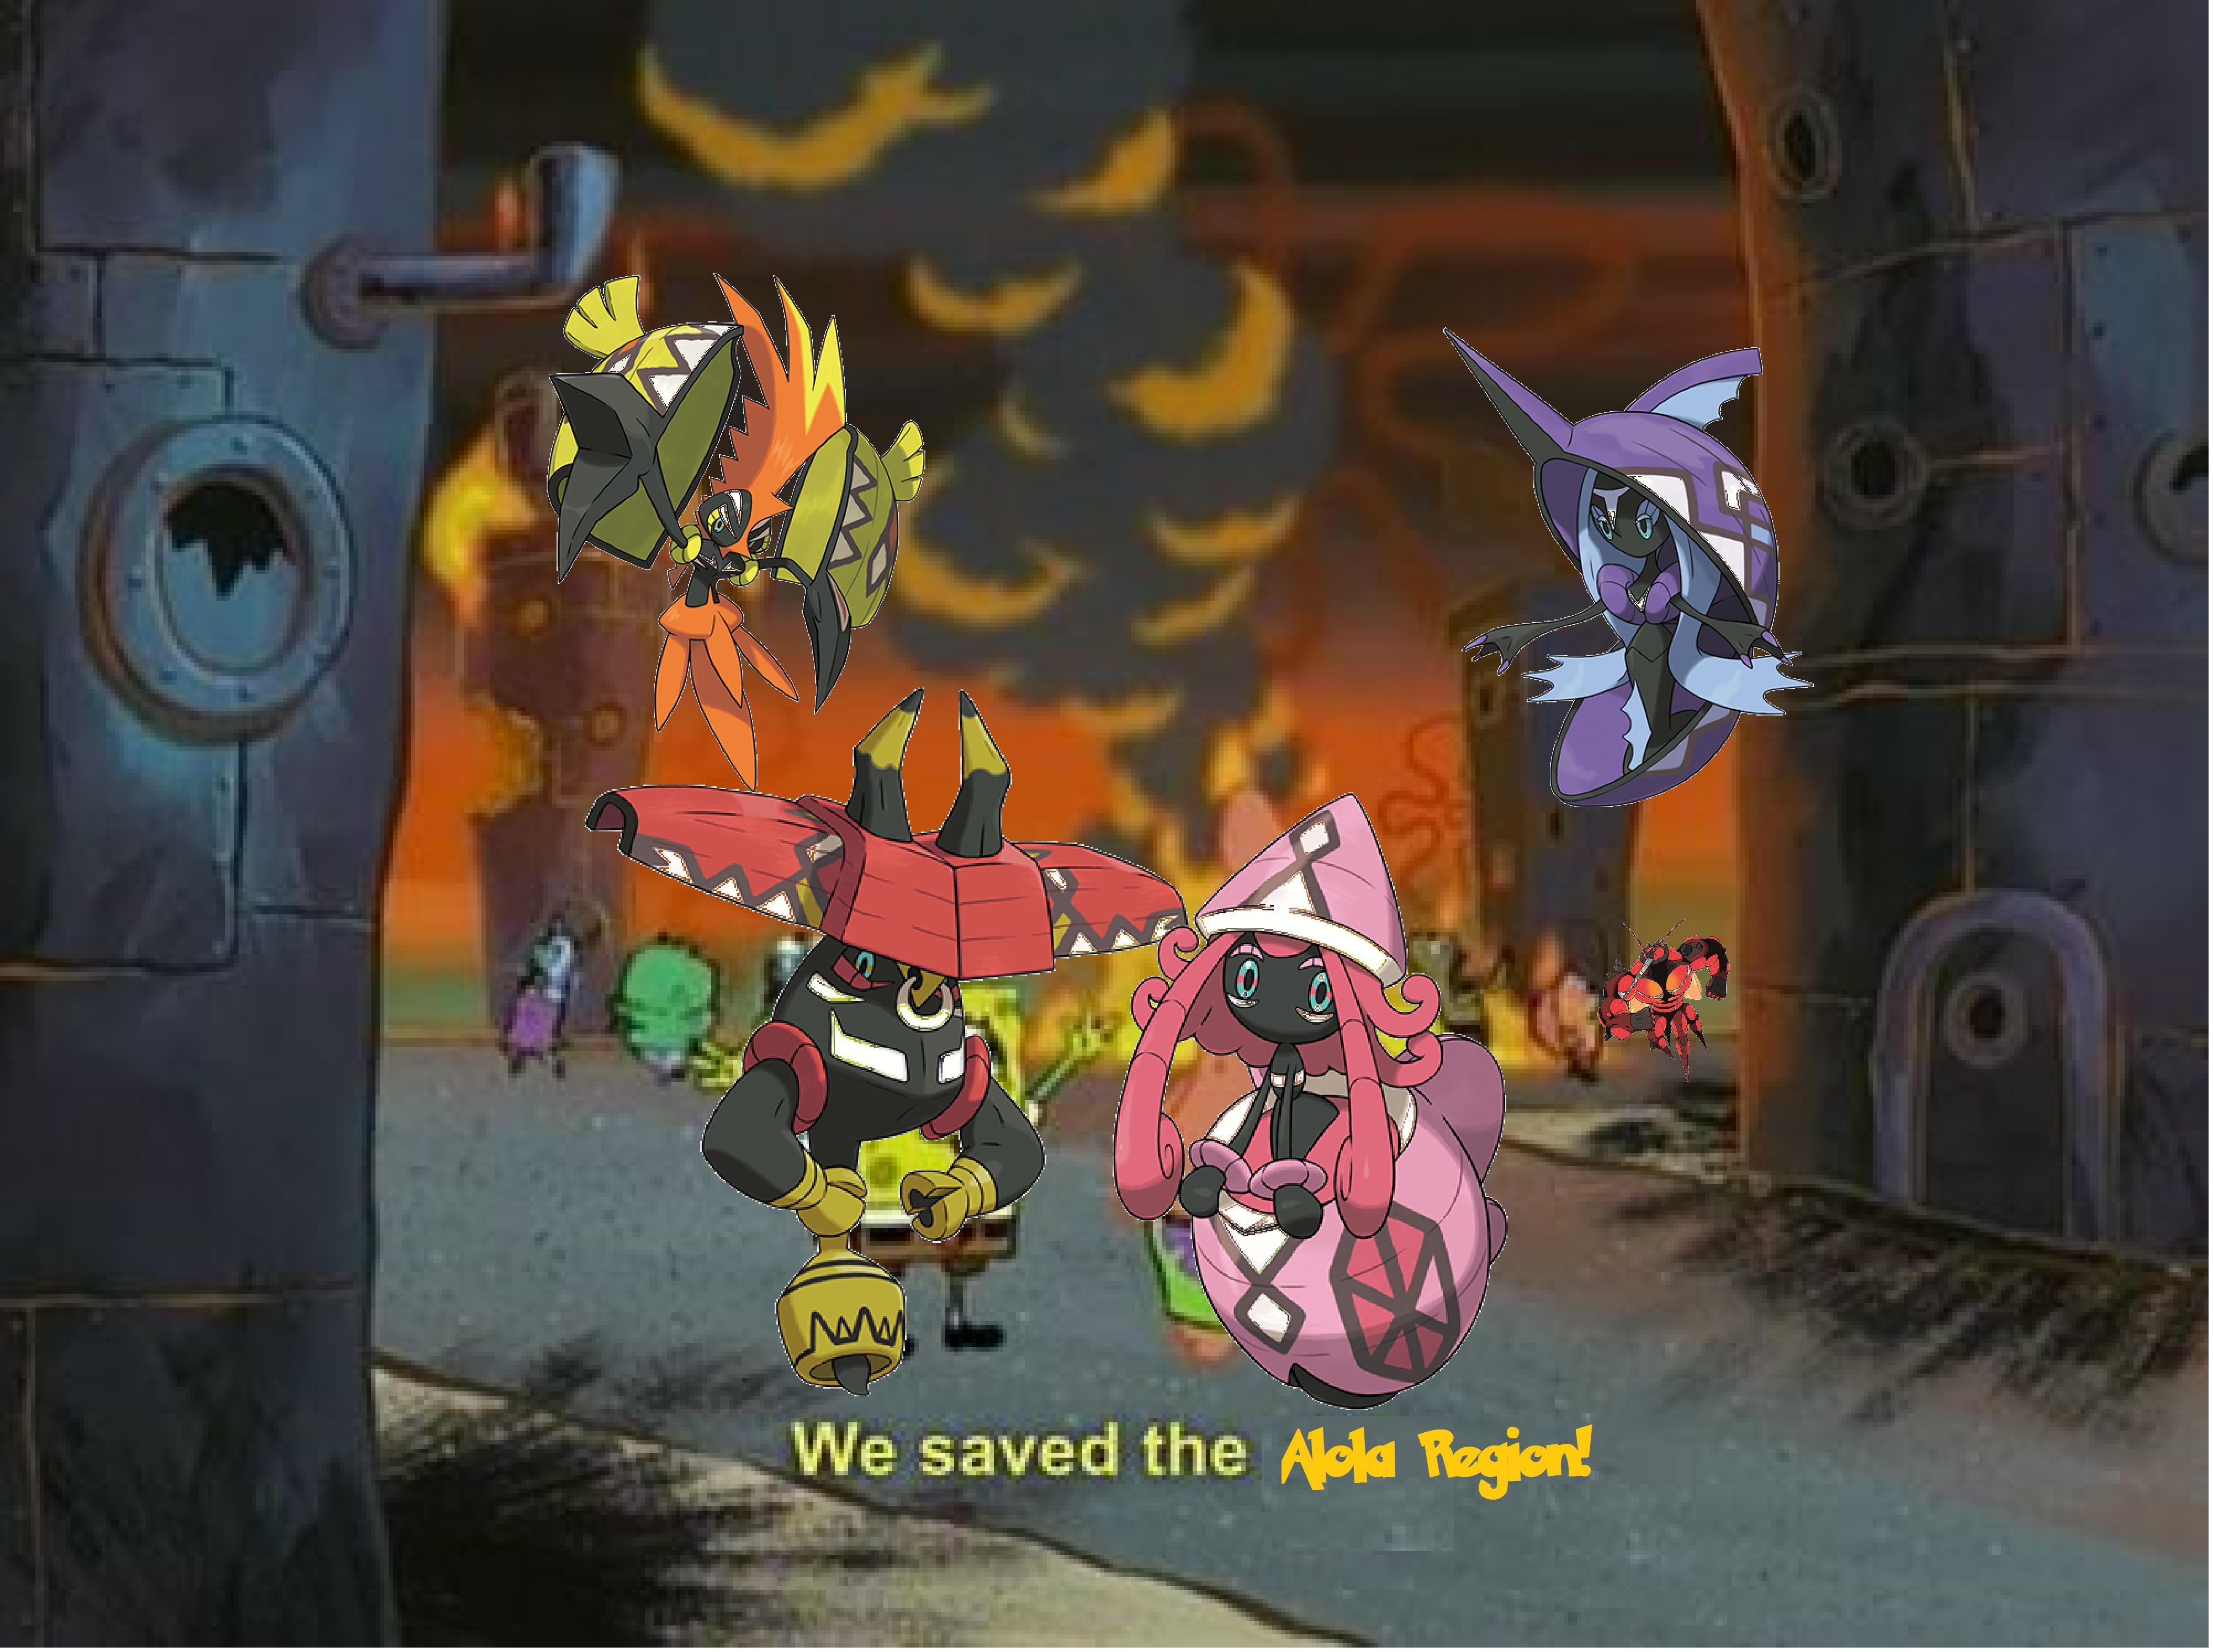 0c6 we saved alola we did it, patrick! we saved the city! know